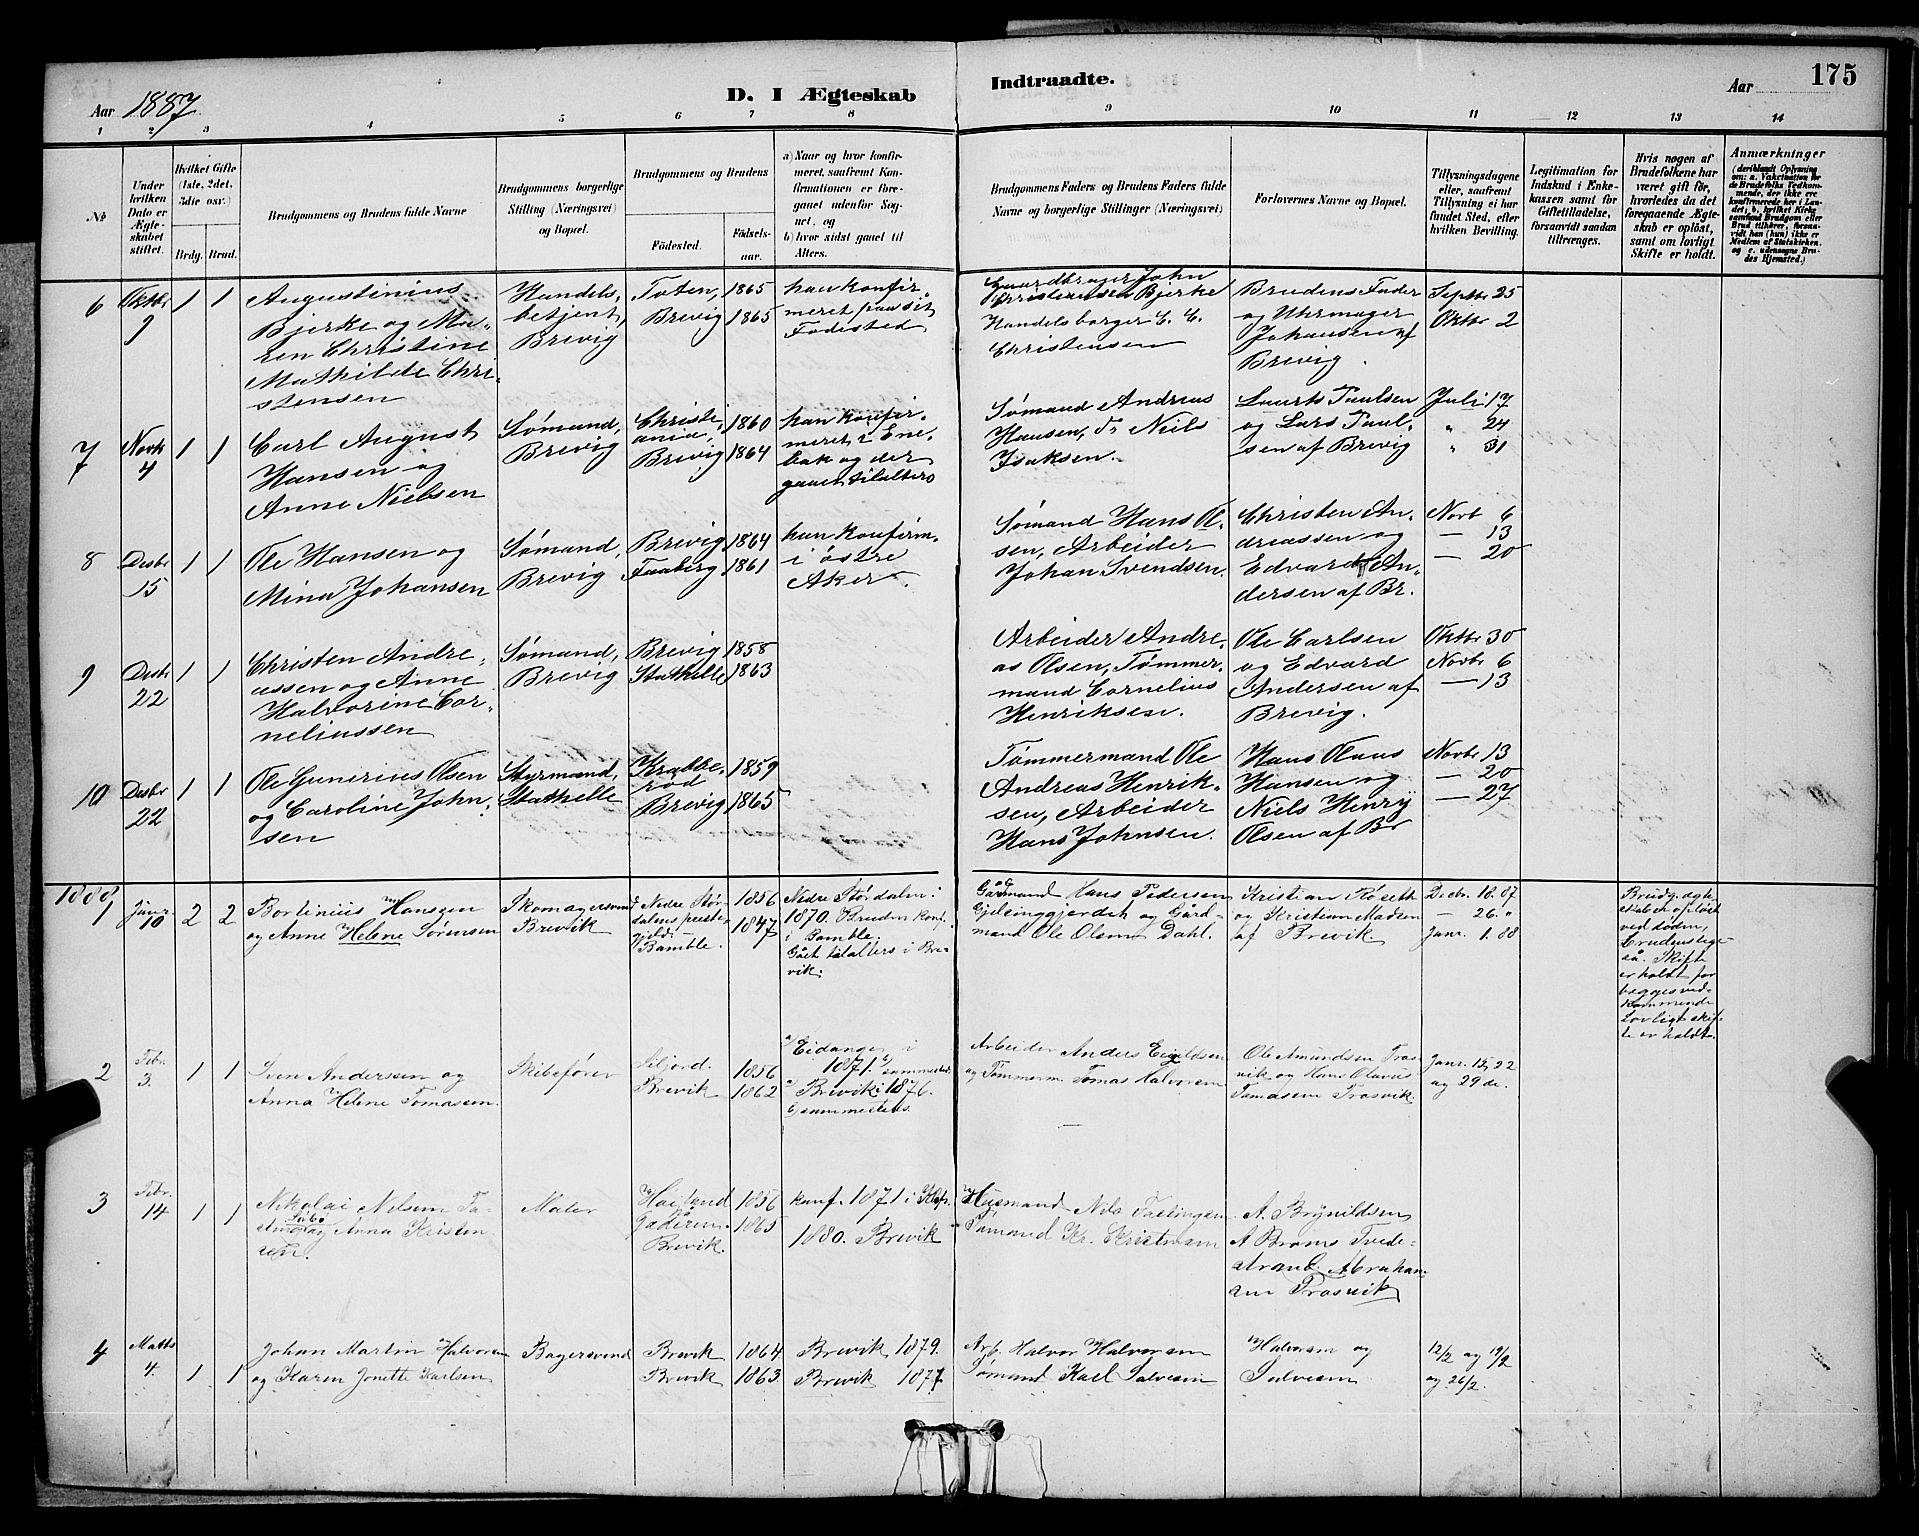 SAKO, Brevik kirkebøker, G/Ga/L0004: Klokkerbok nr. 4, 1882-1900, s. 175